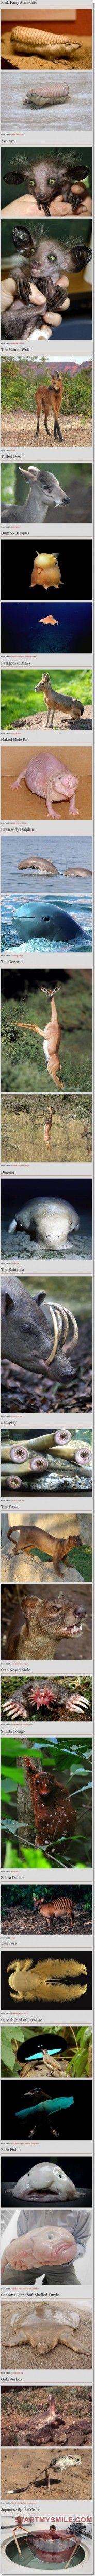 ROFL, this is funny Weird animals errmigawd